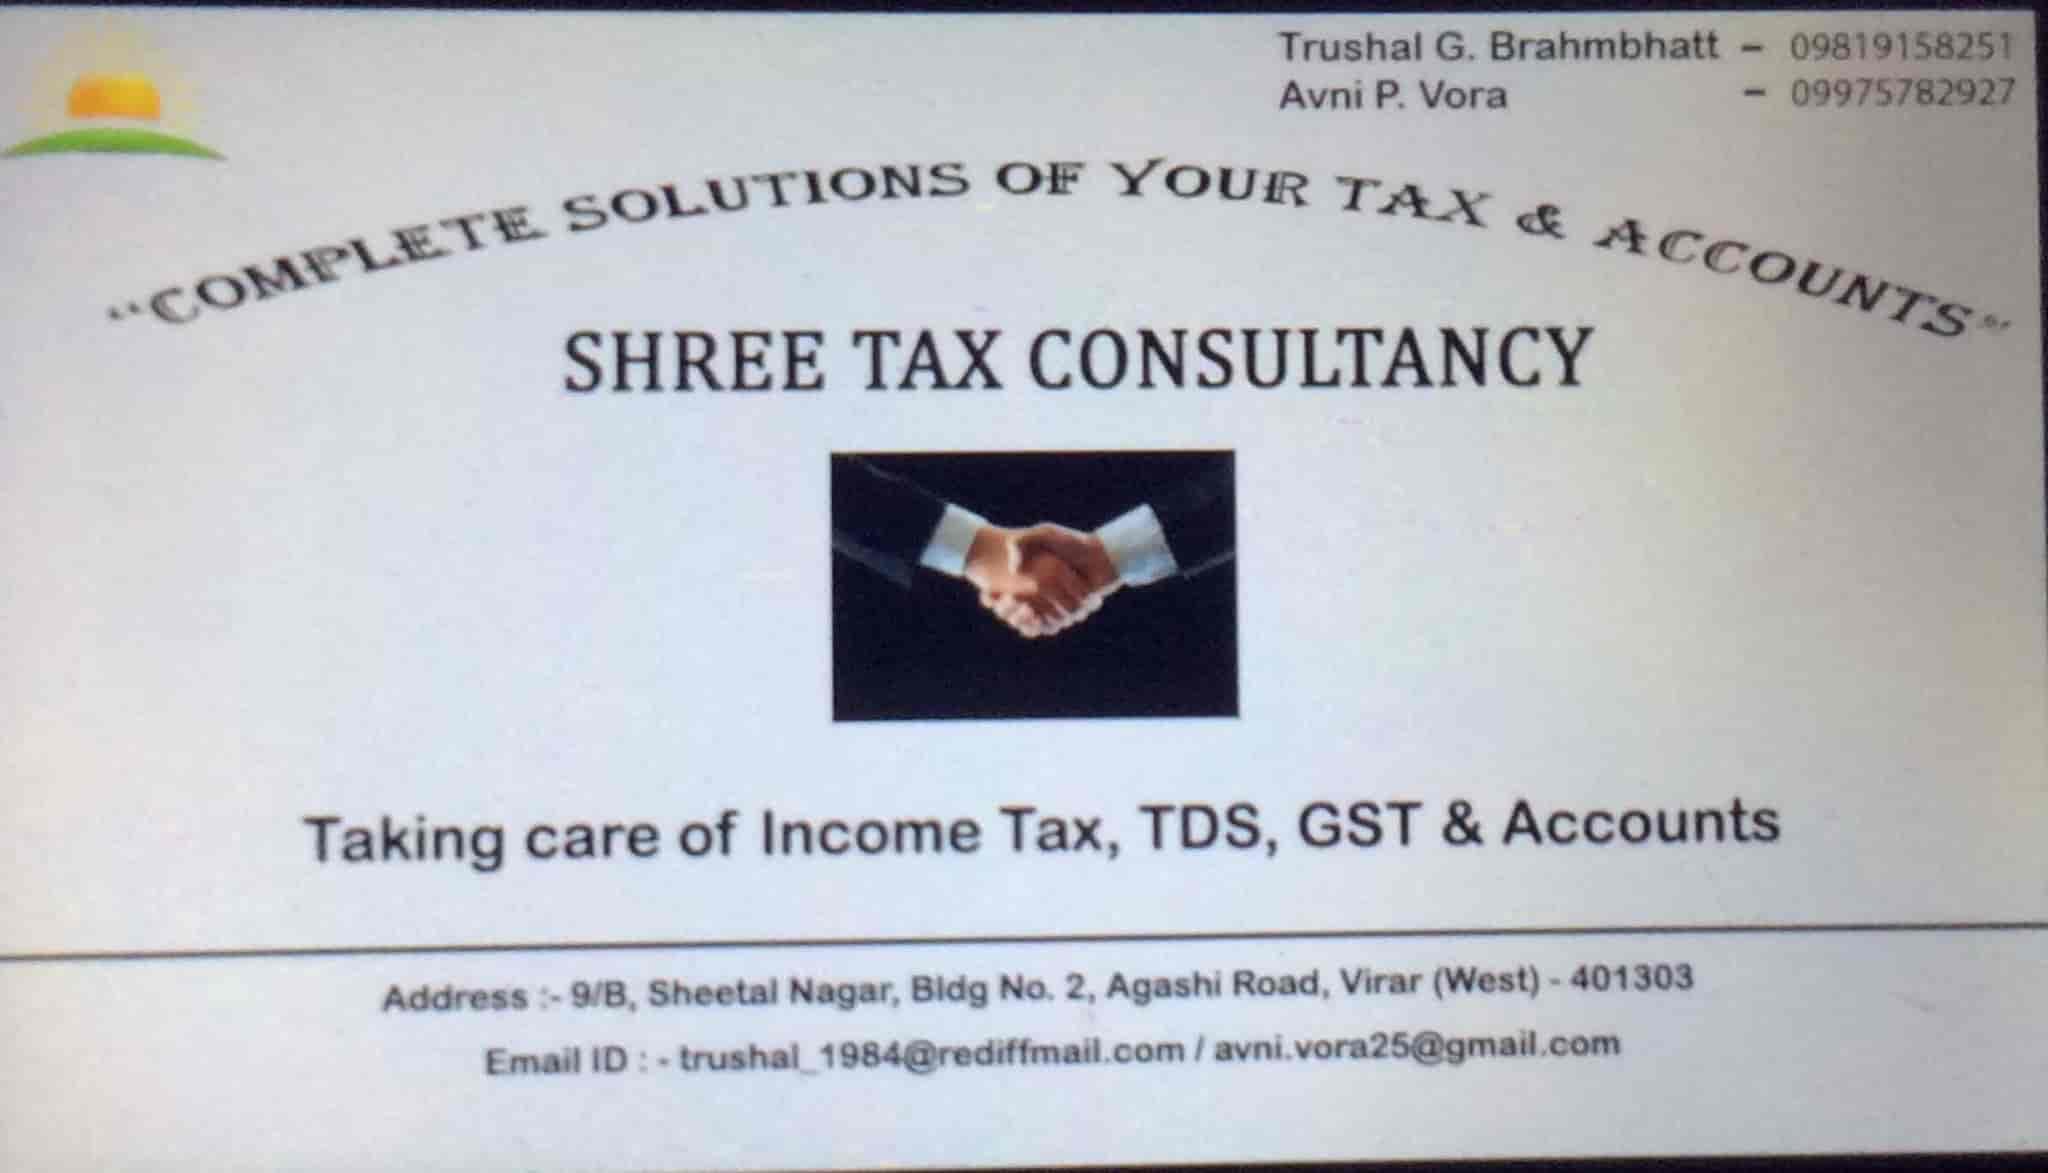 Shree tax consultancy photos virar west mumbai pictures images visiting card shree tax consultancy photos virar west mumbai income tax consultants colourmoves